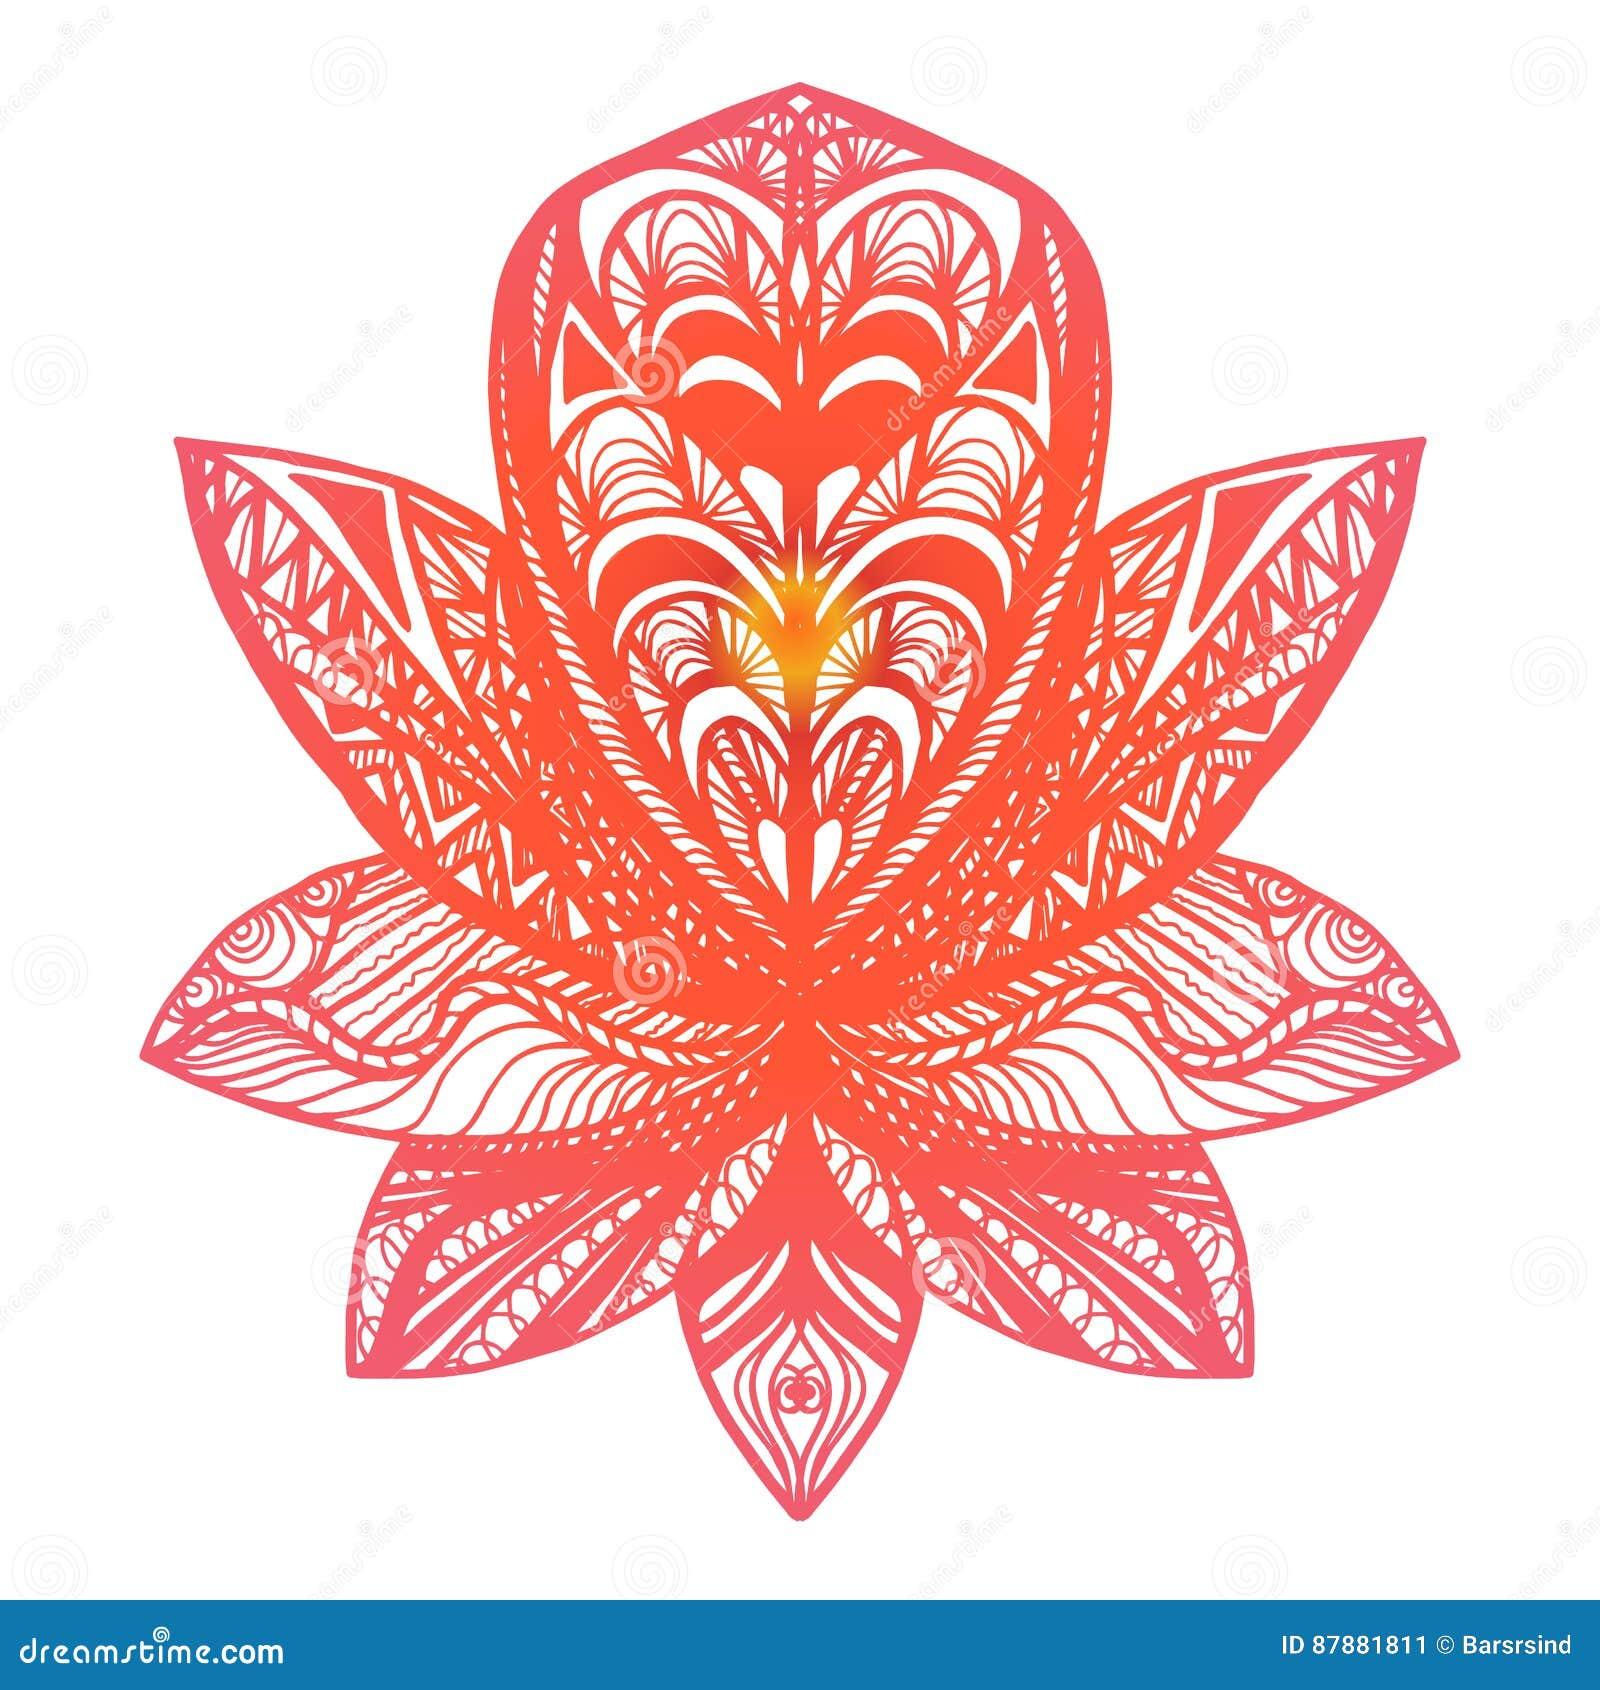 Flower lotus tattoo stock illustration illustration of botany download flower lotus tattoo stock illustration illustration of botany 87881811 izmirmasajfo